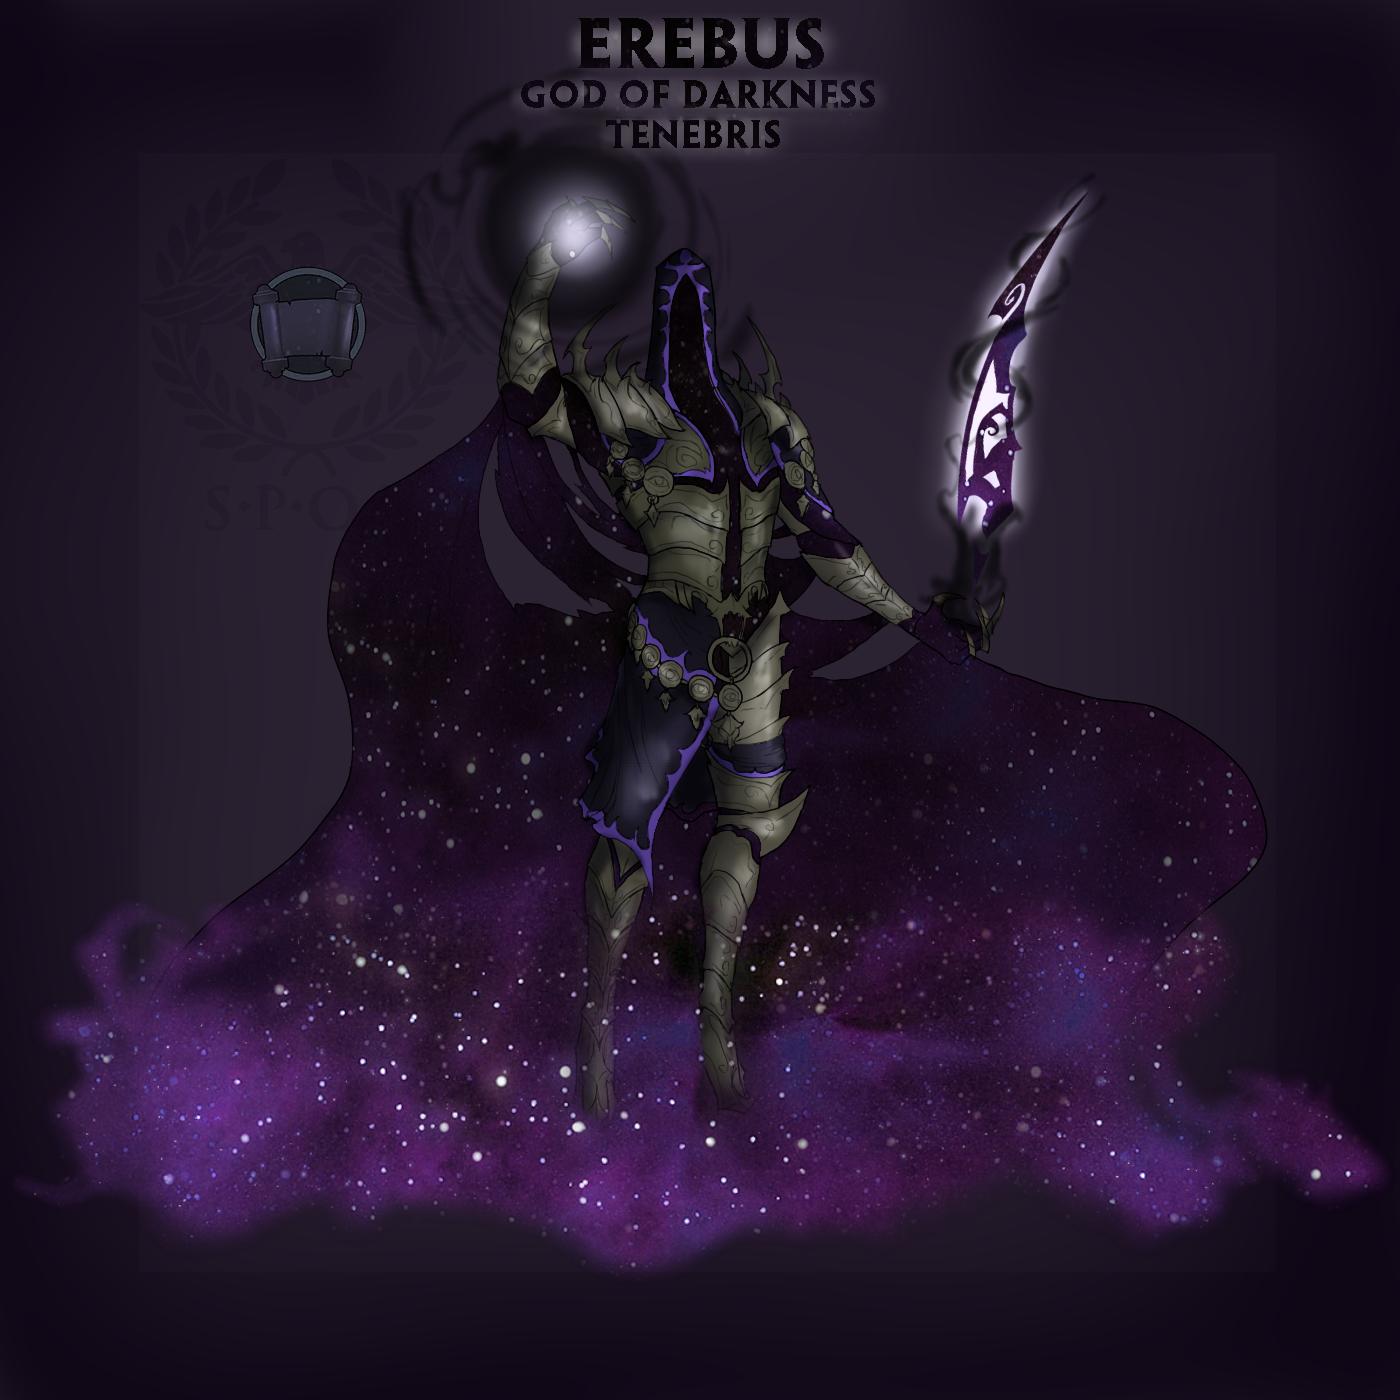 Erebus God Of Darkness